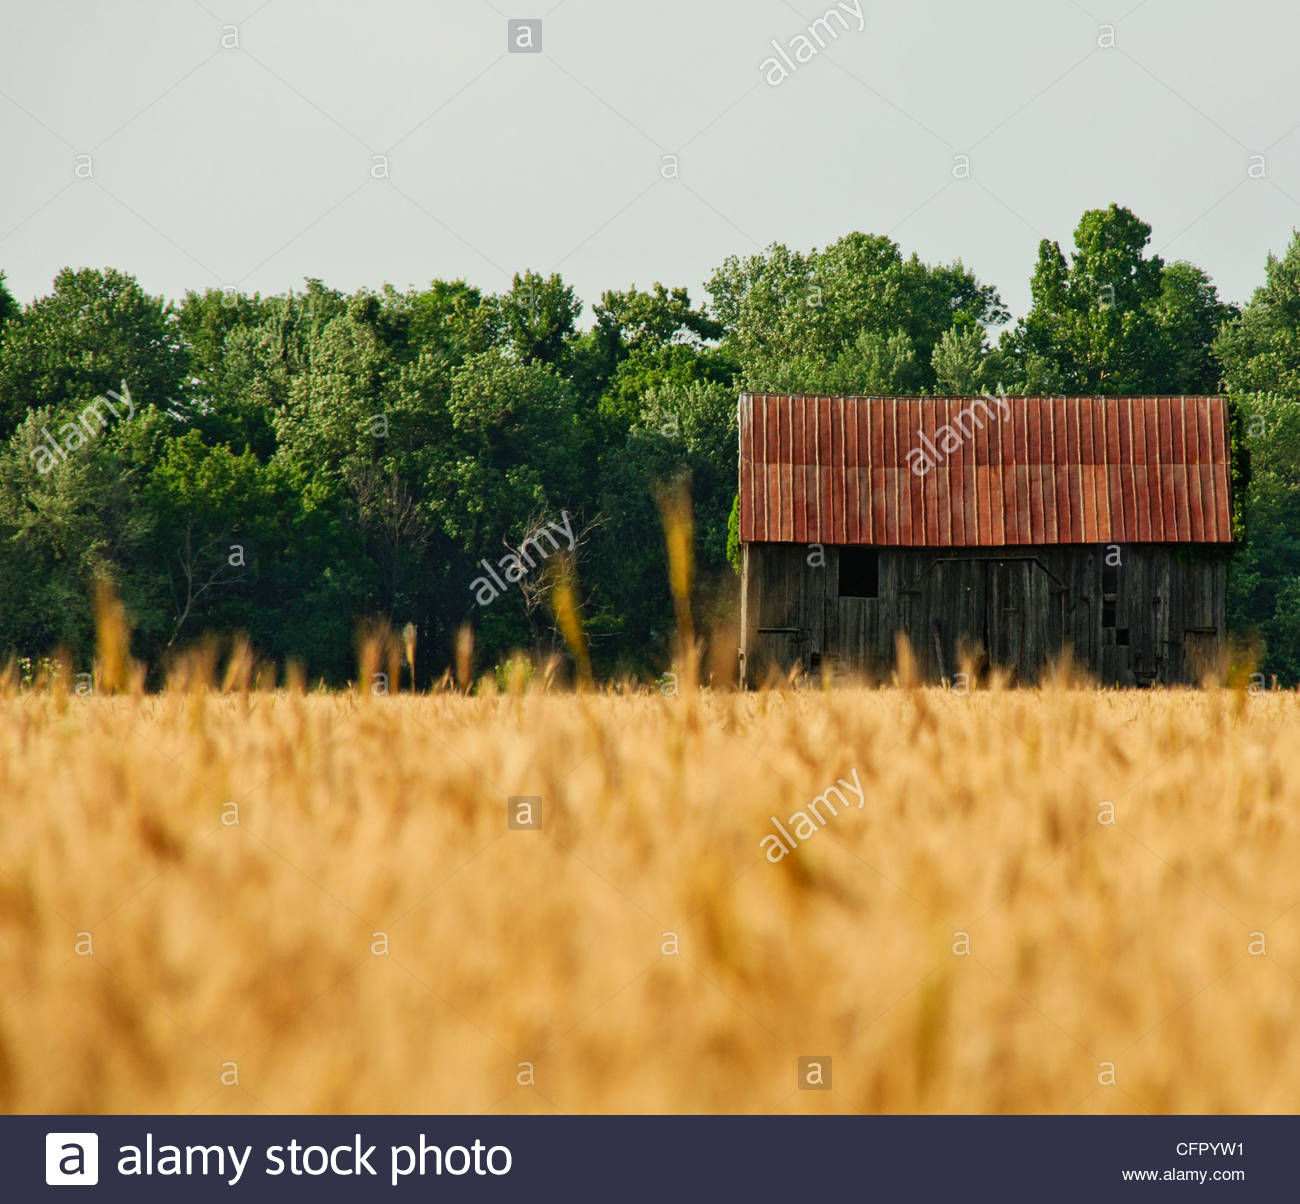 Rustic Barn in Wheat Field, Rural Sedan, KS, June 12, 2010 - Stock Image